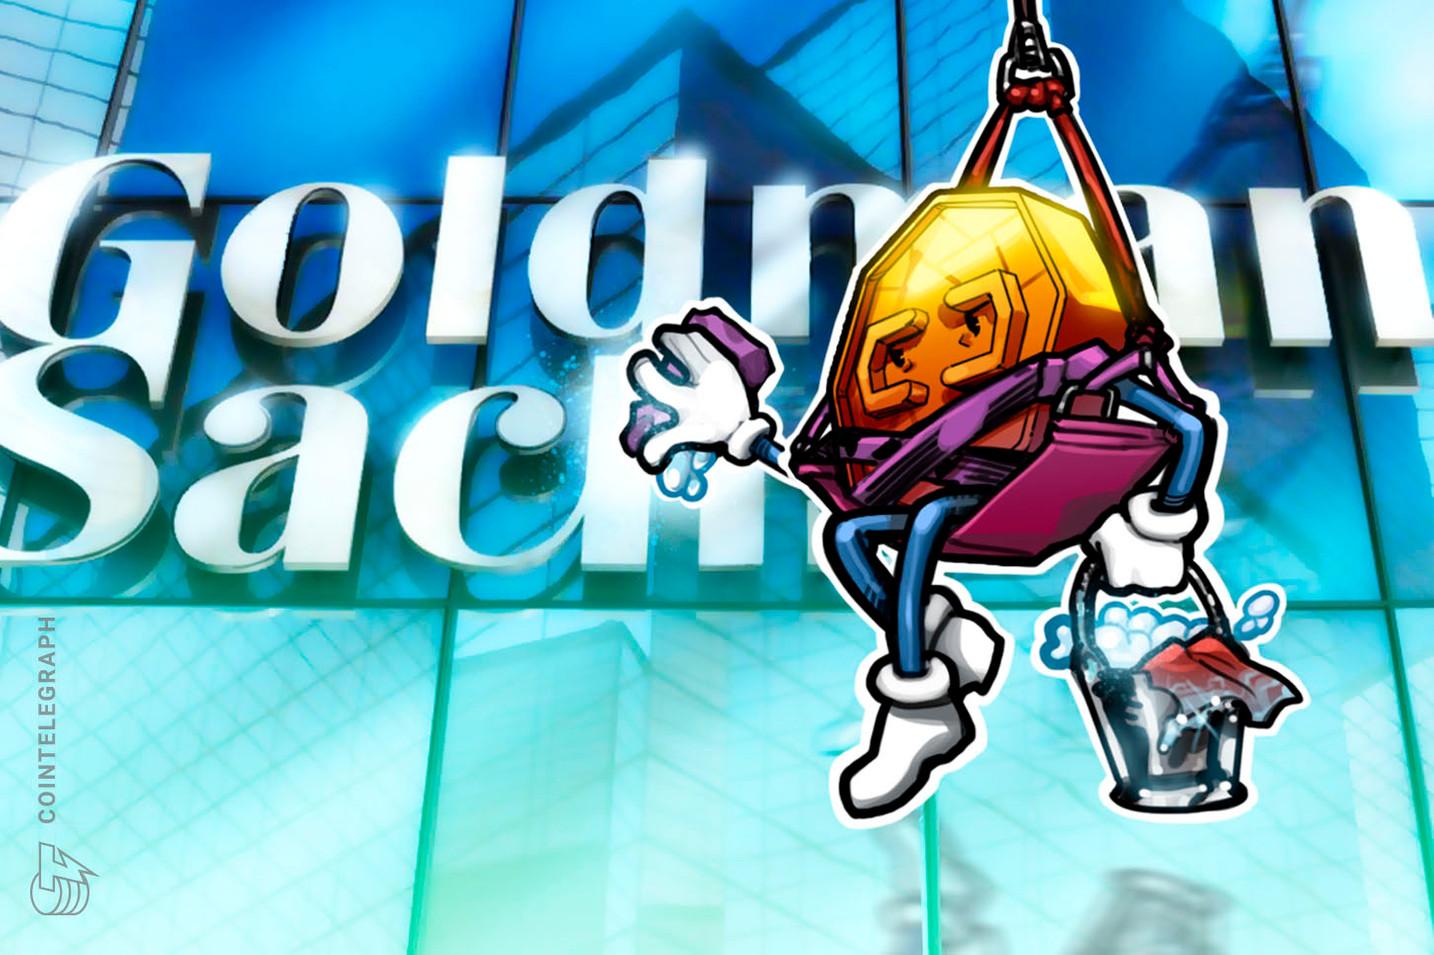 Las opiniones de Goldman Sachs y Bloomberg son contrarias respecto a Bitcoin